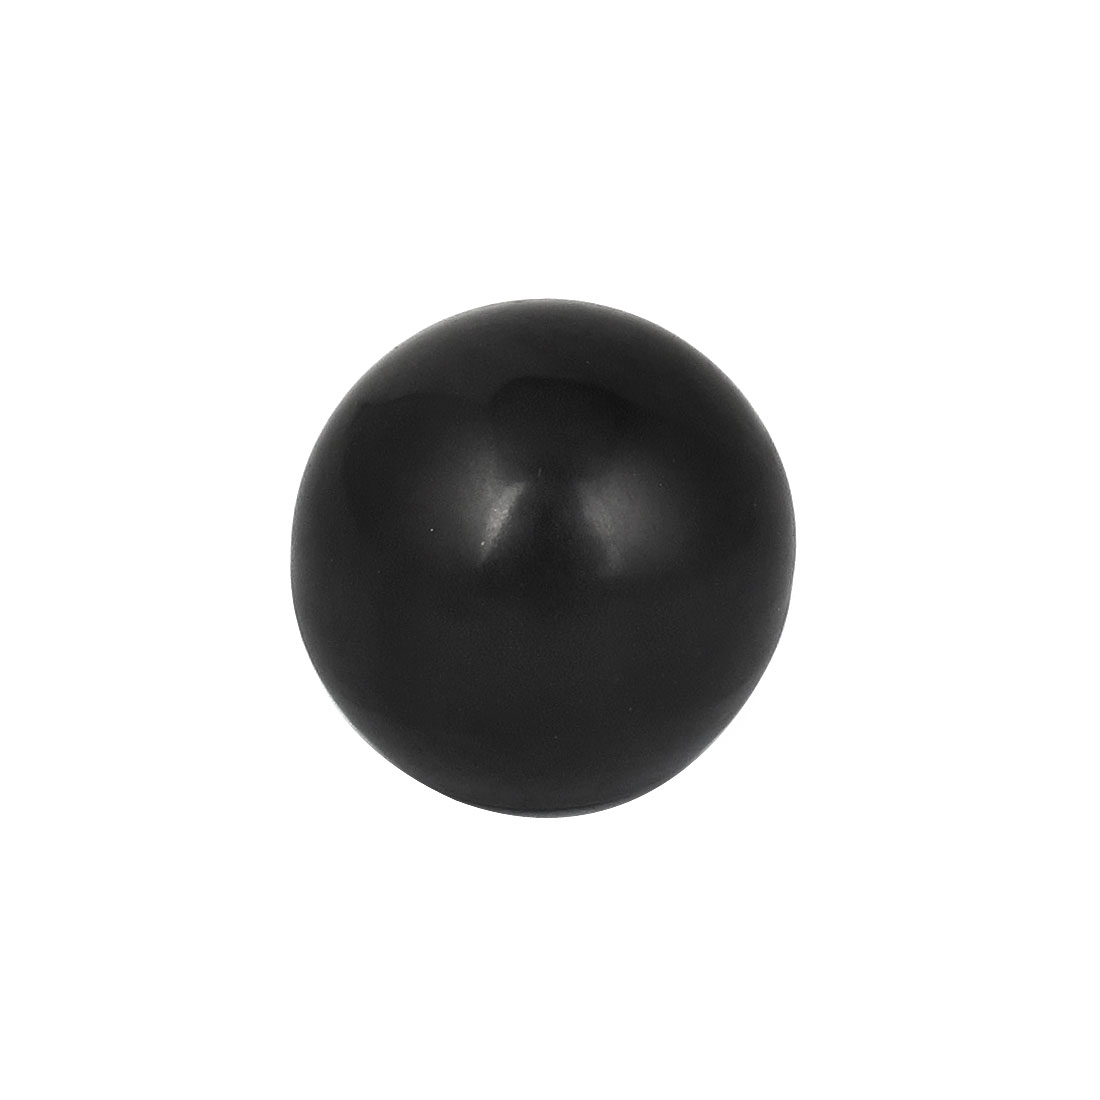 M7 x 22mm Female Thread Round 32mm Diameter Ball Lever Knob Black